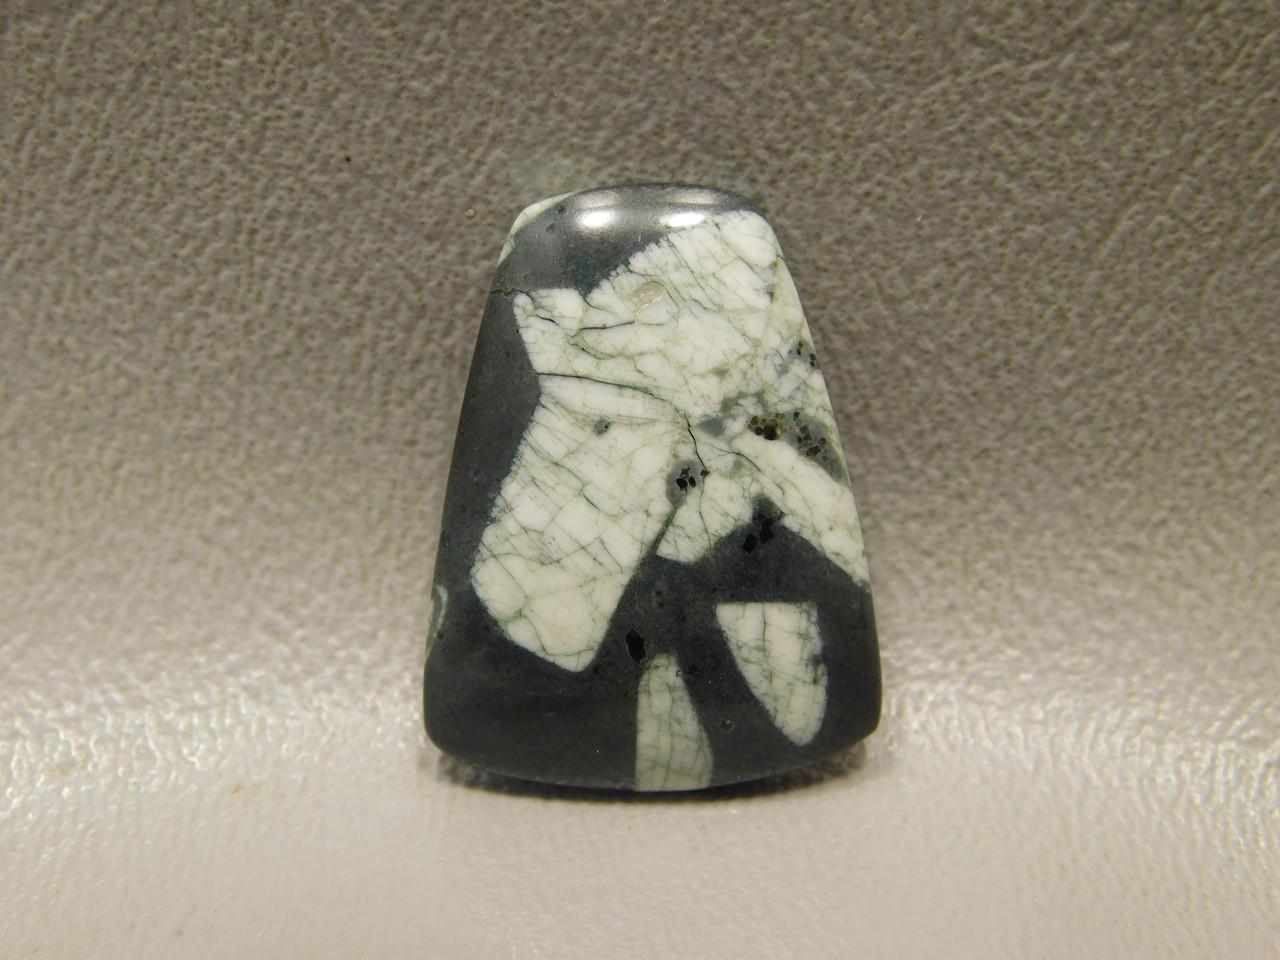 Chinese Writing Rock Cabochon Designer Gemstone #6